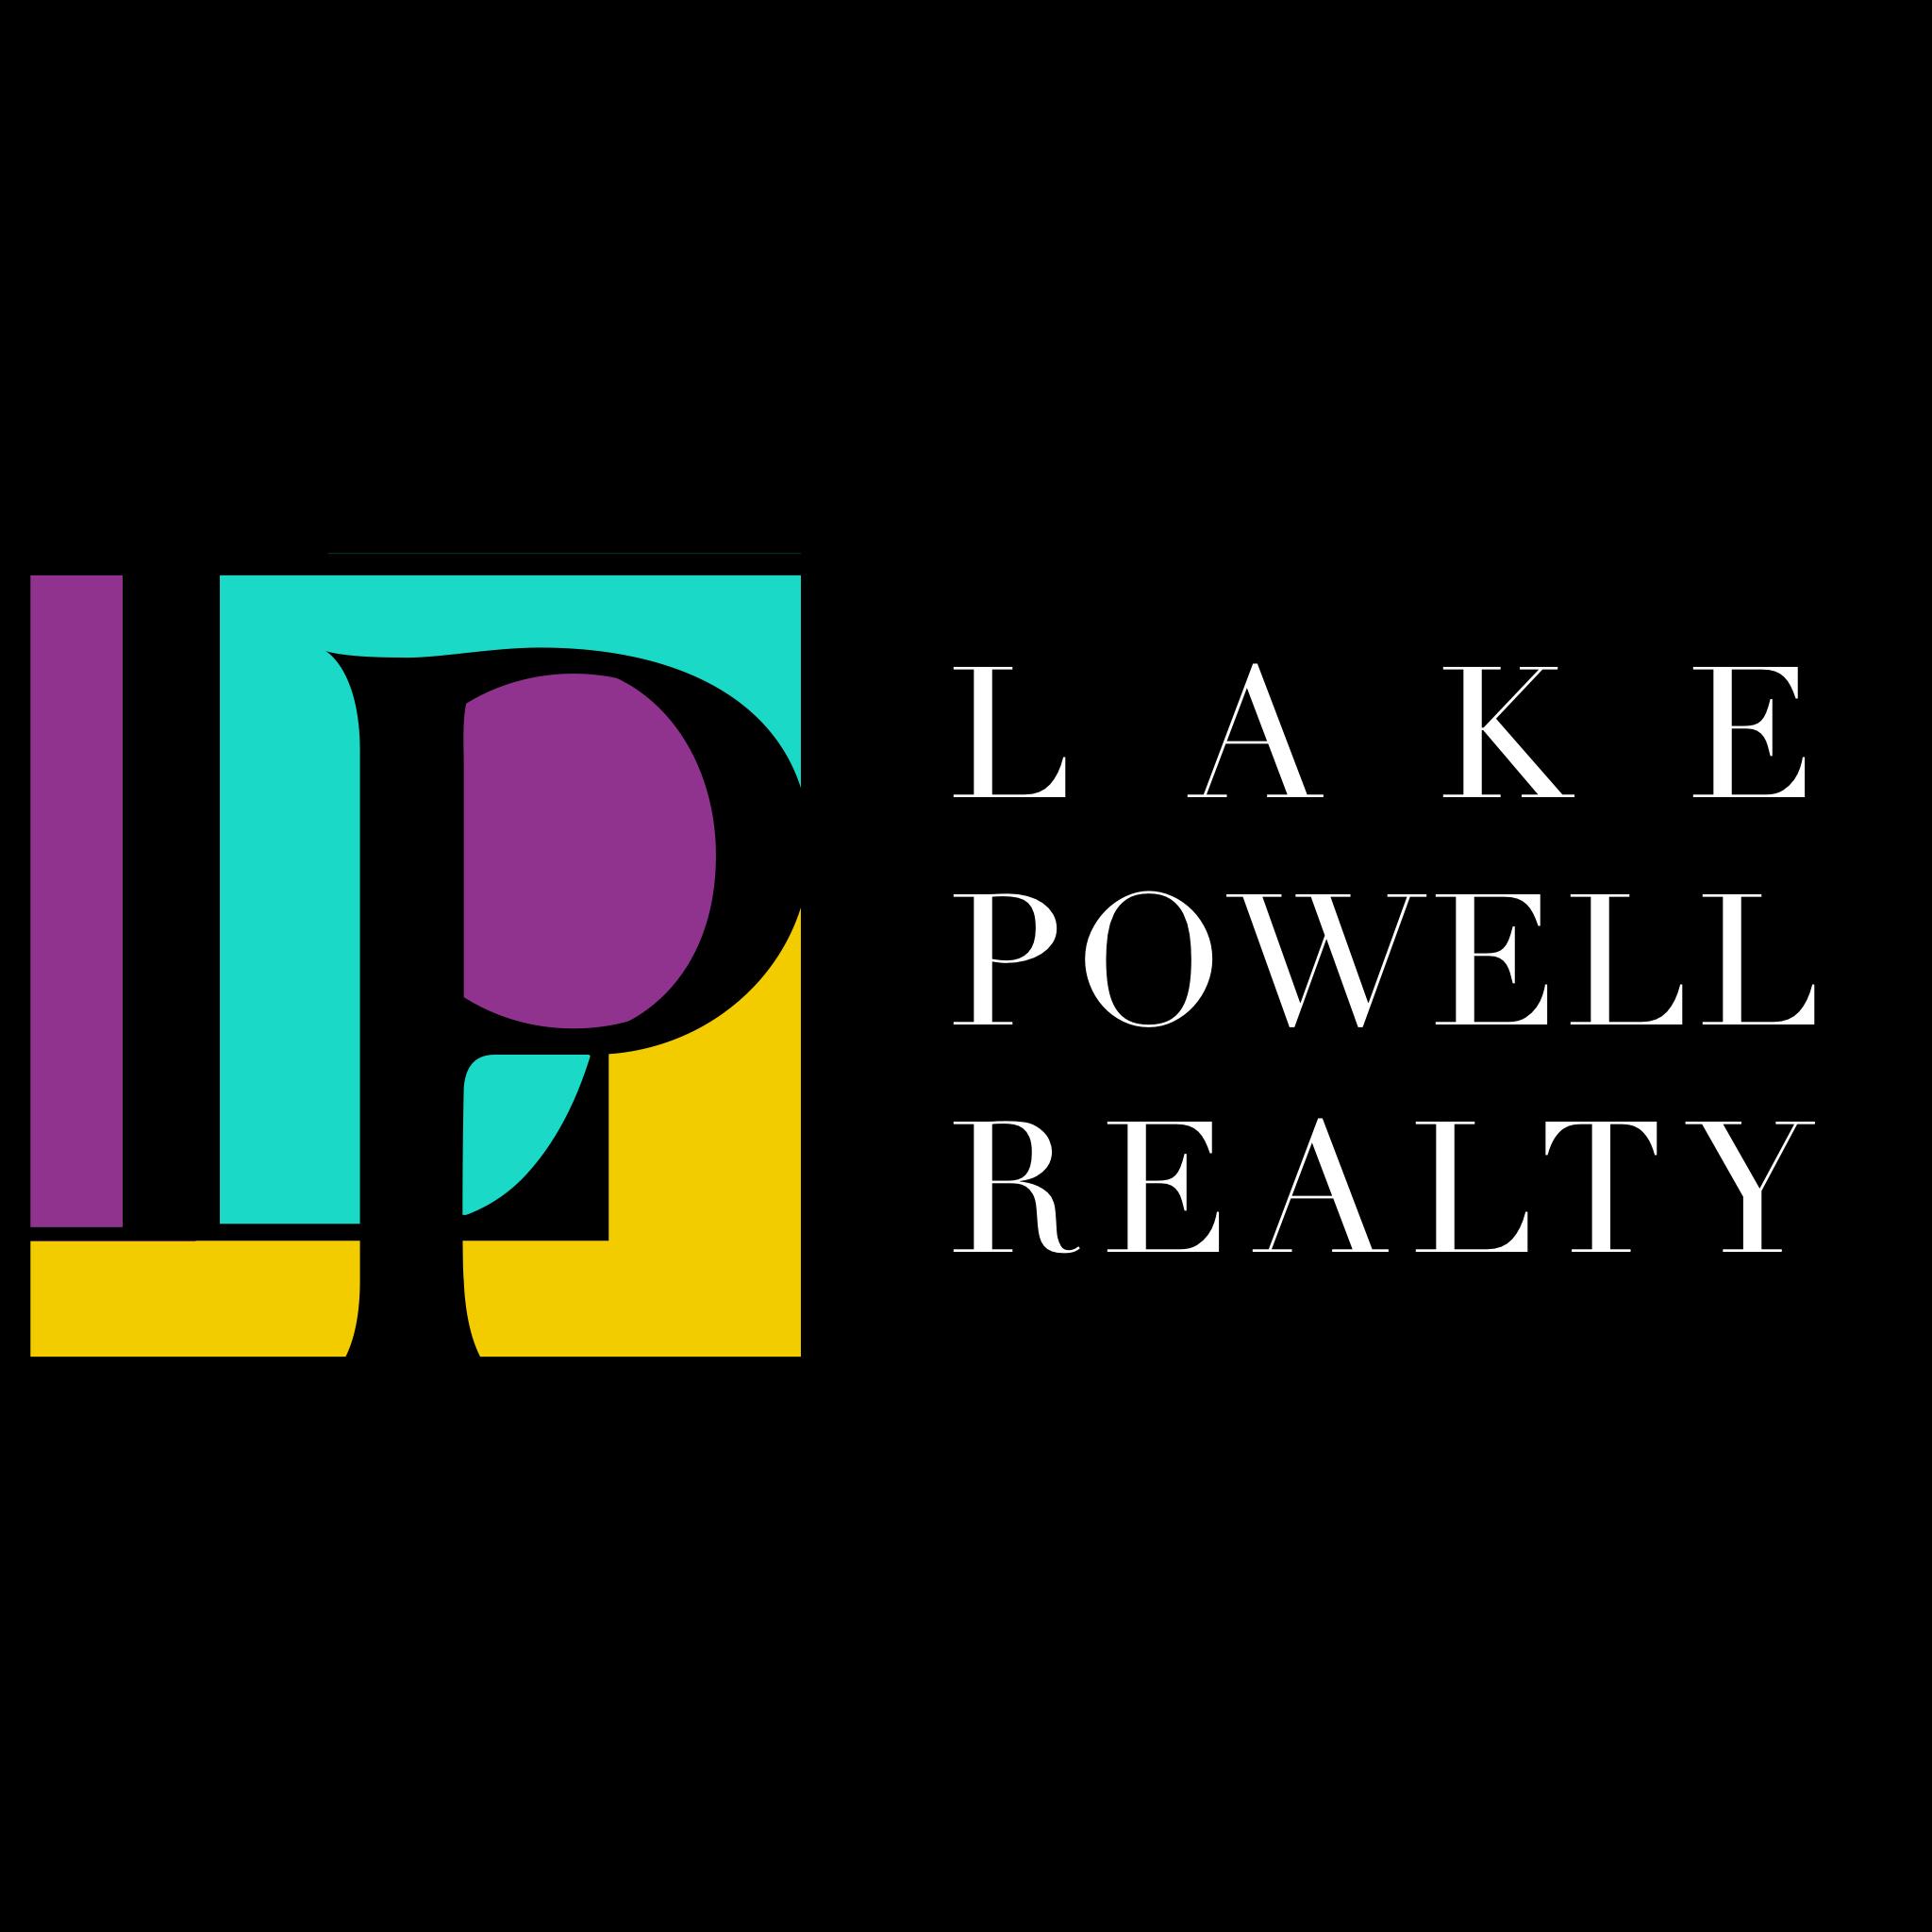 Holly Helme | Lake Powell Realty - Page, AZ 86040 - (928)660-3320 | ShowMeLocal.com